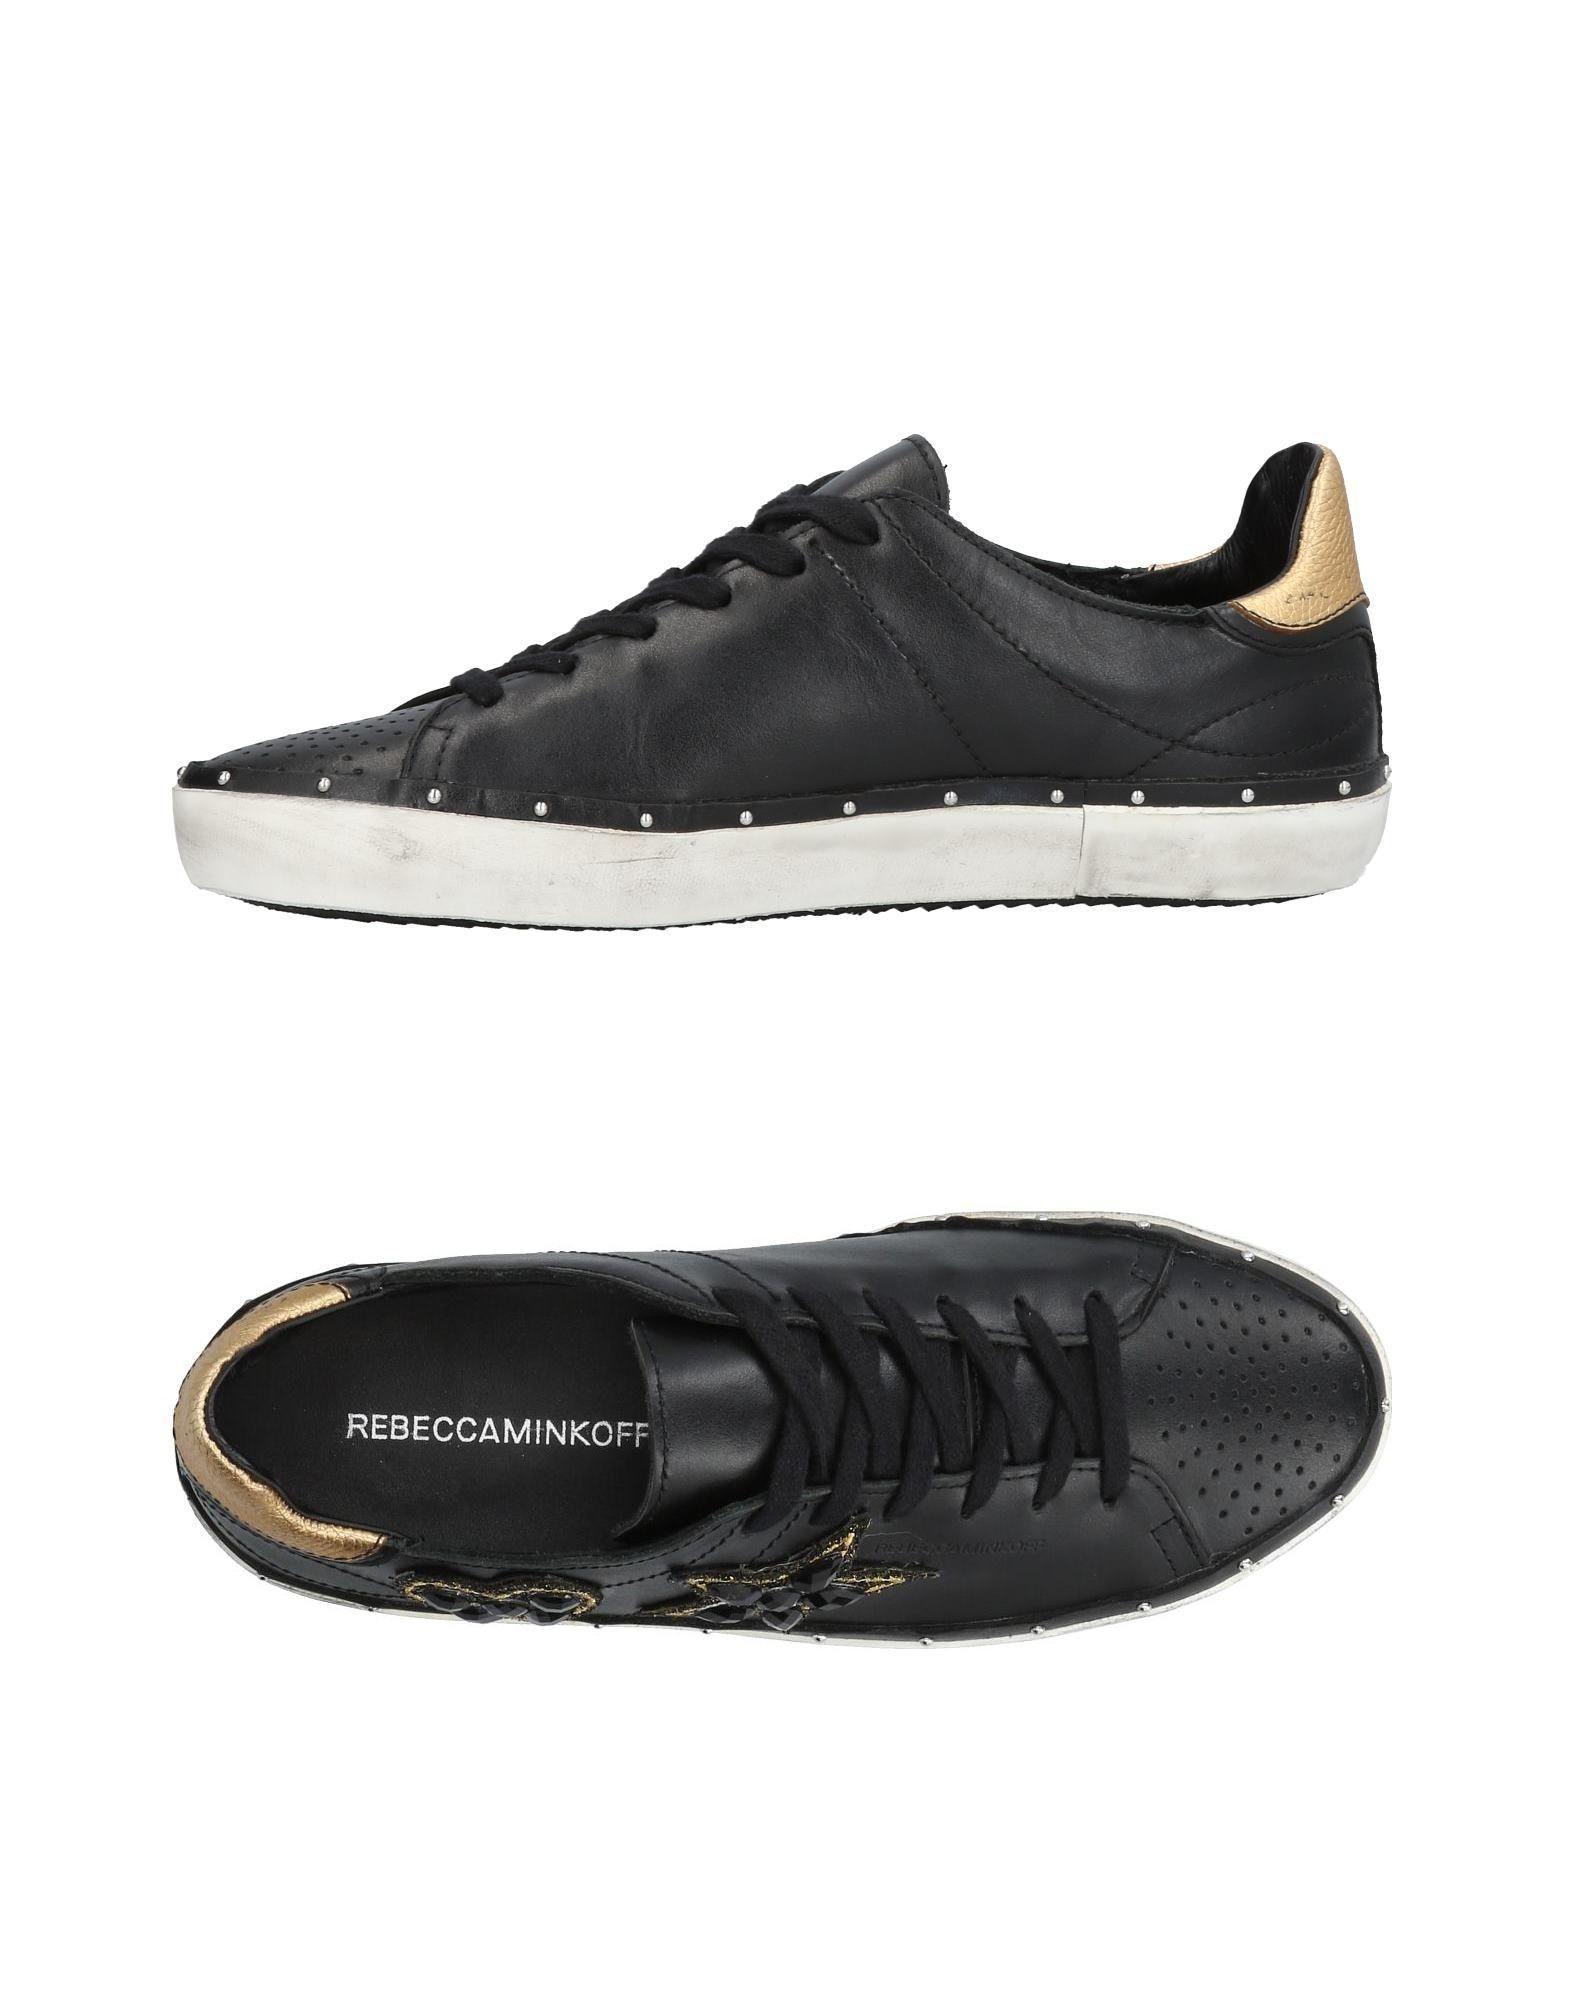 Rebecca Minkoff Sneakers In Black